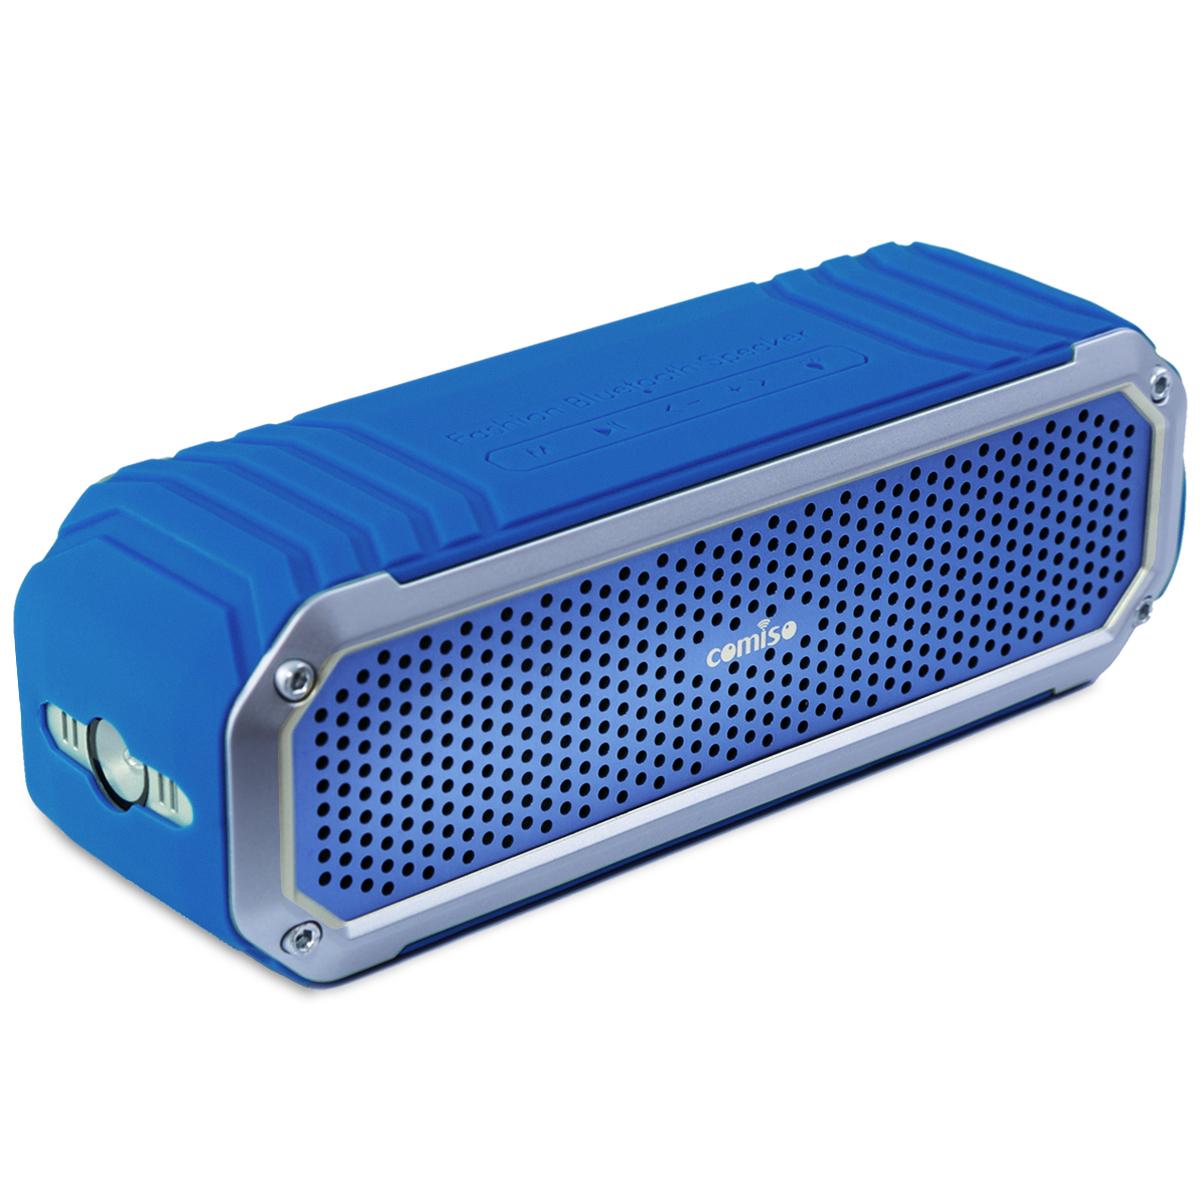 10w portable bluetooth stereo bass speaker waterproof. Black Bedroom Furniture Sets. Home Design Ideas